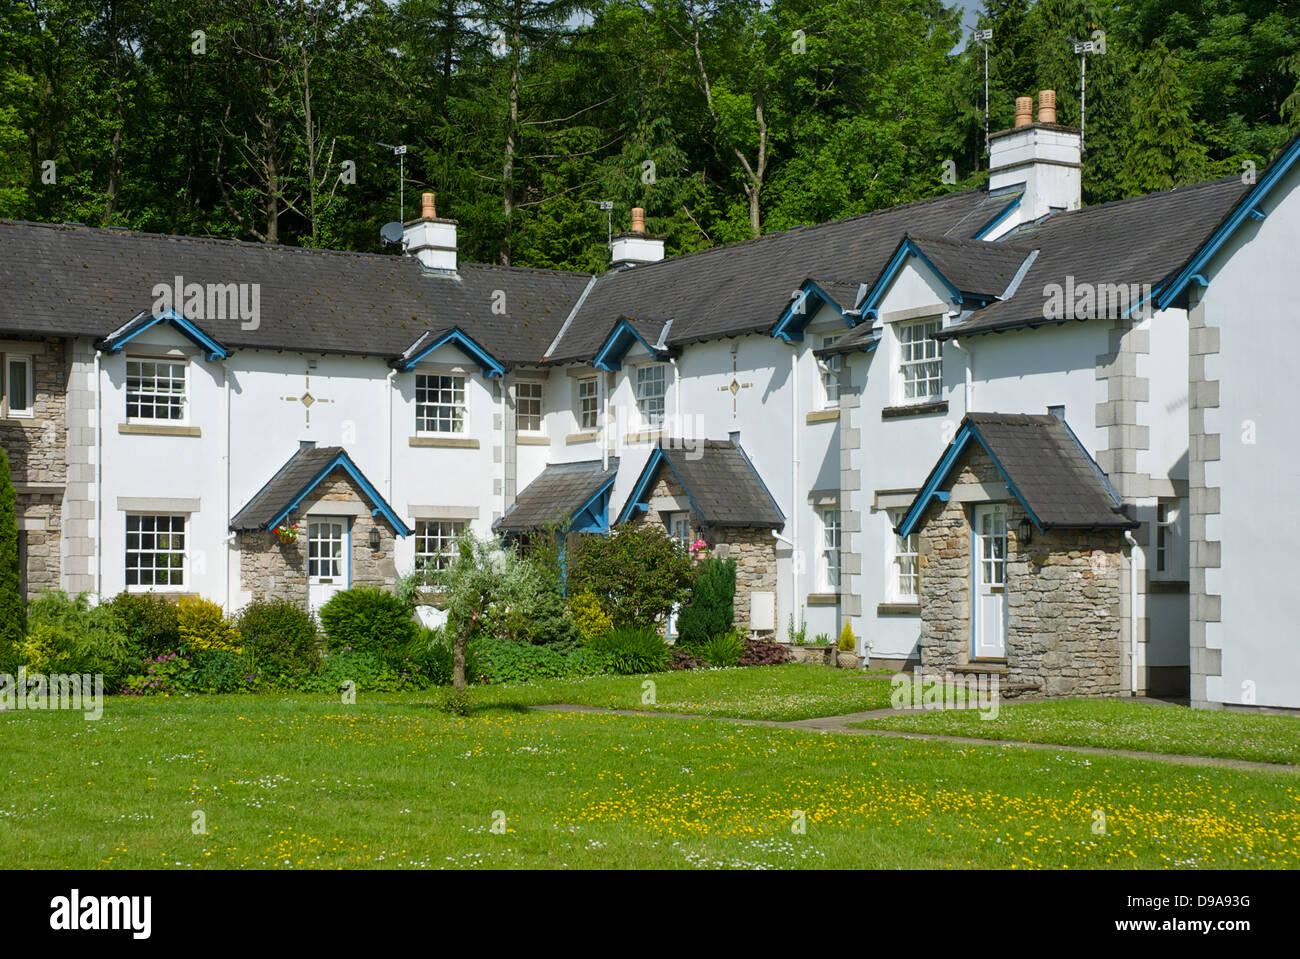 Stylised houses in the Holker estate village, South Lakeland, Cumbria, England UK - Stock Image